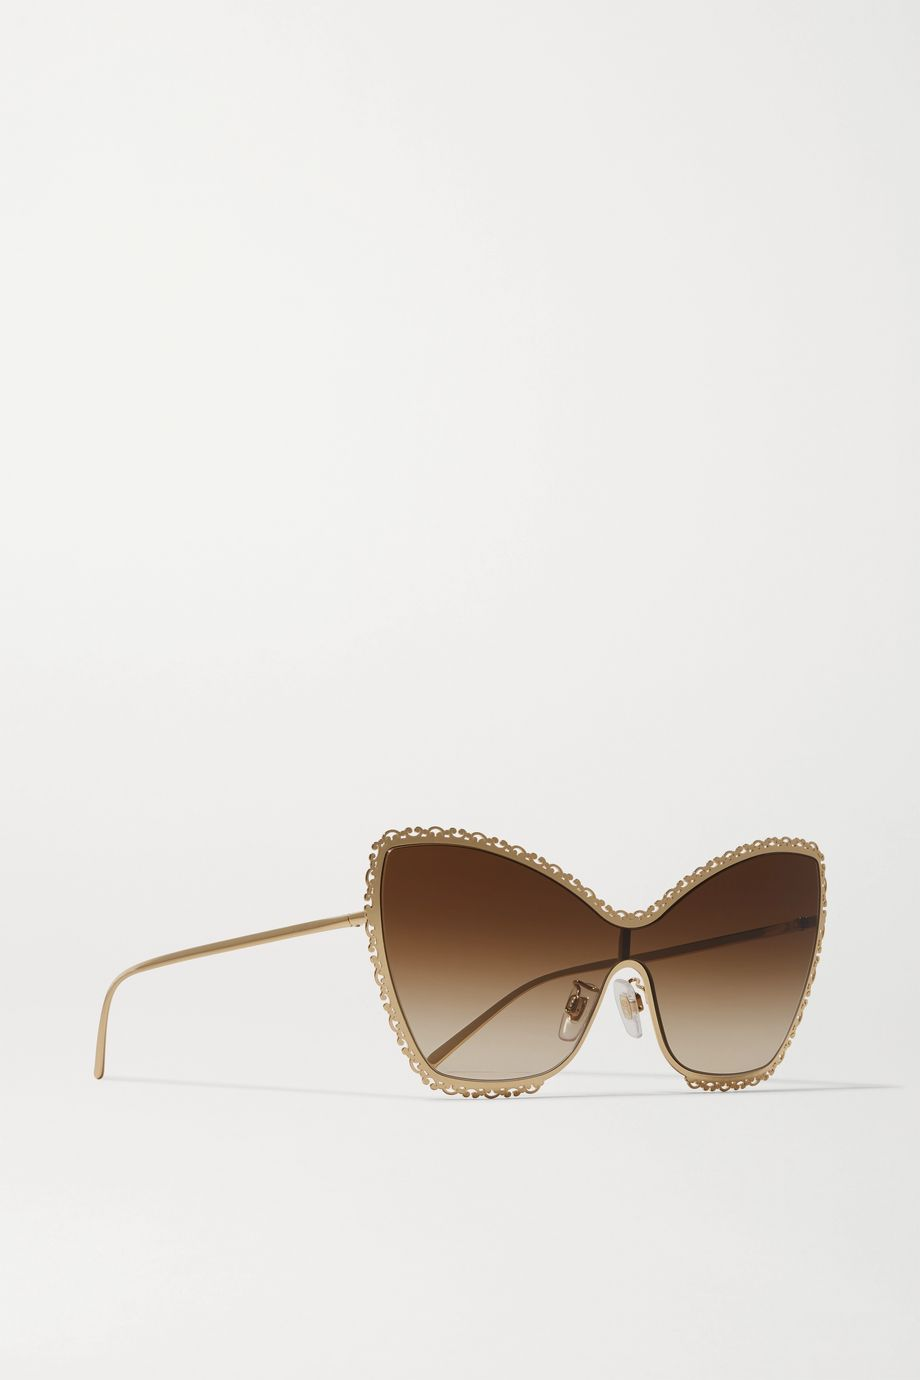 Dolce & Gabbana Devotion cat-eye gold-tone sunglasses